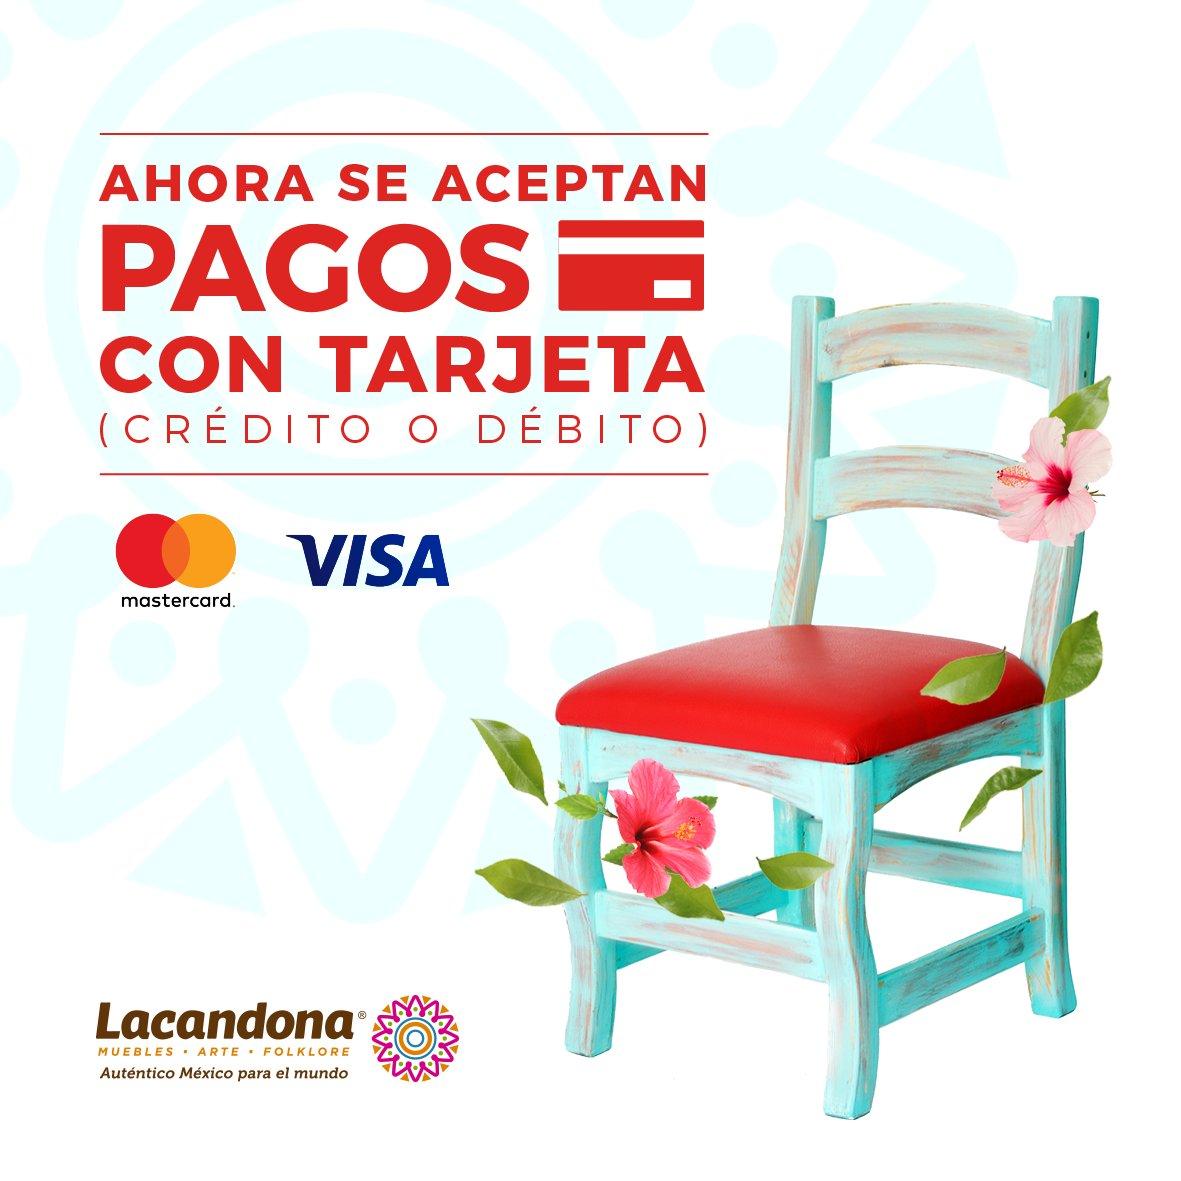 Aut Nticom Xico Hashtag On Twitter # Muebles Lacandona